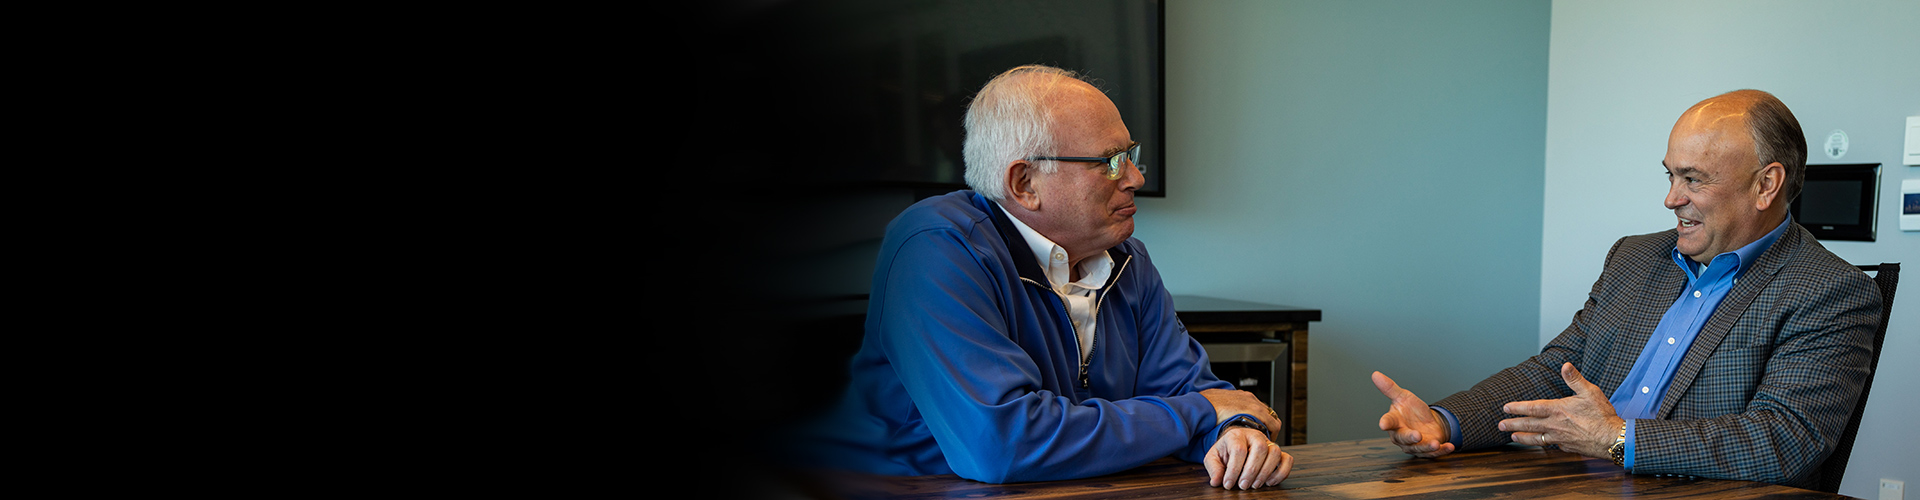 PTC kauf Onshape - Jon Hirstick und Jim Heppelmann